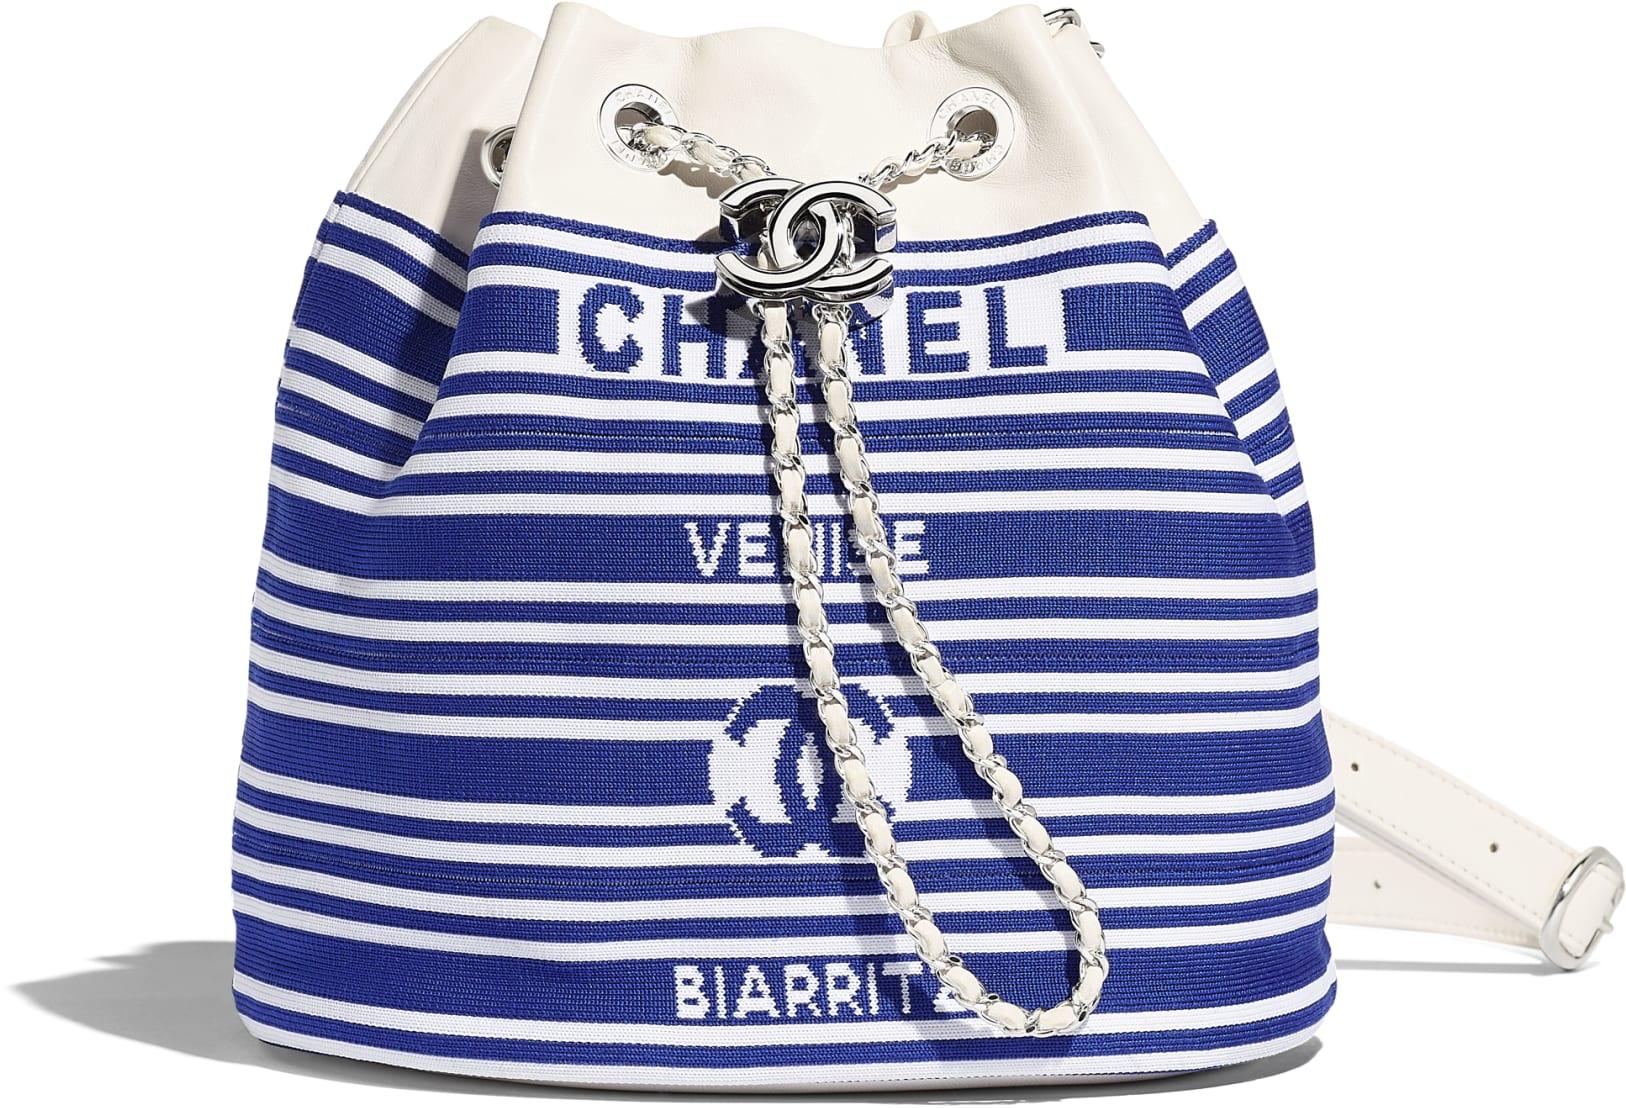 Borsa a secchiello alla marinara Chanel a 3300 euro